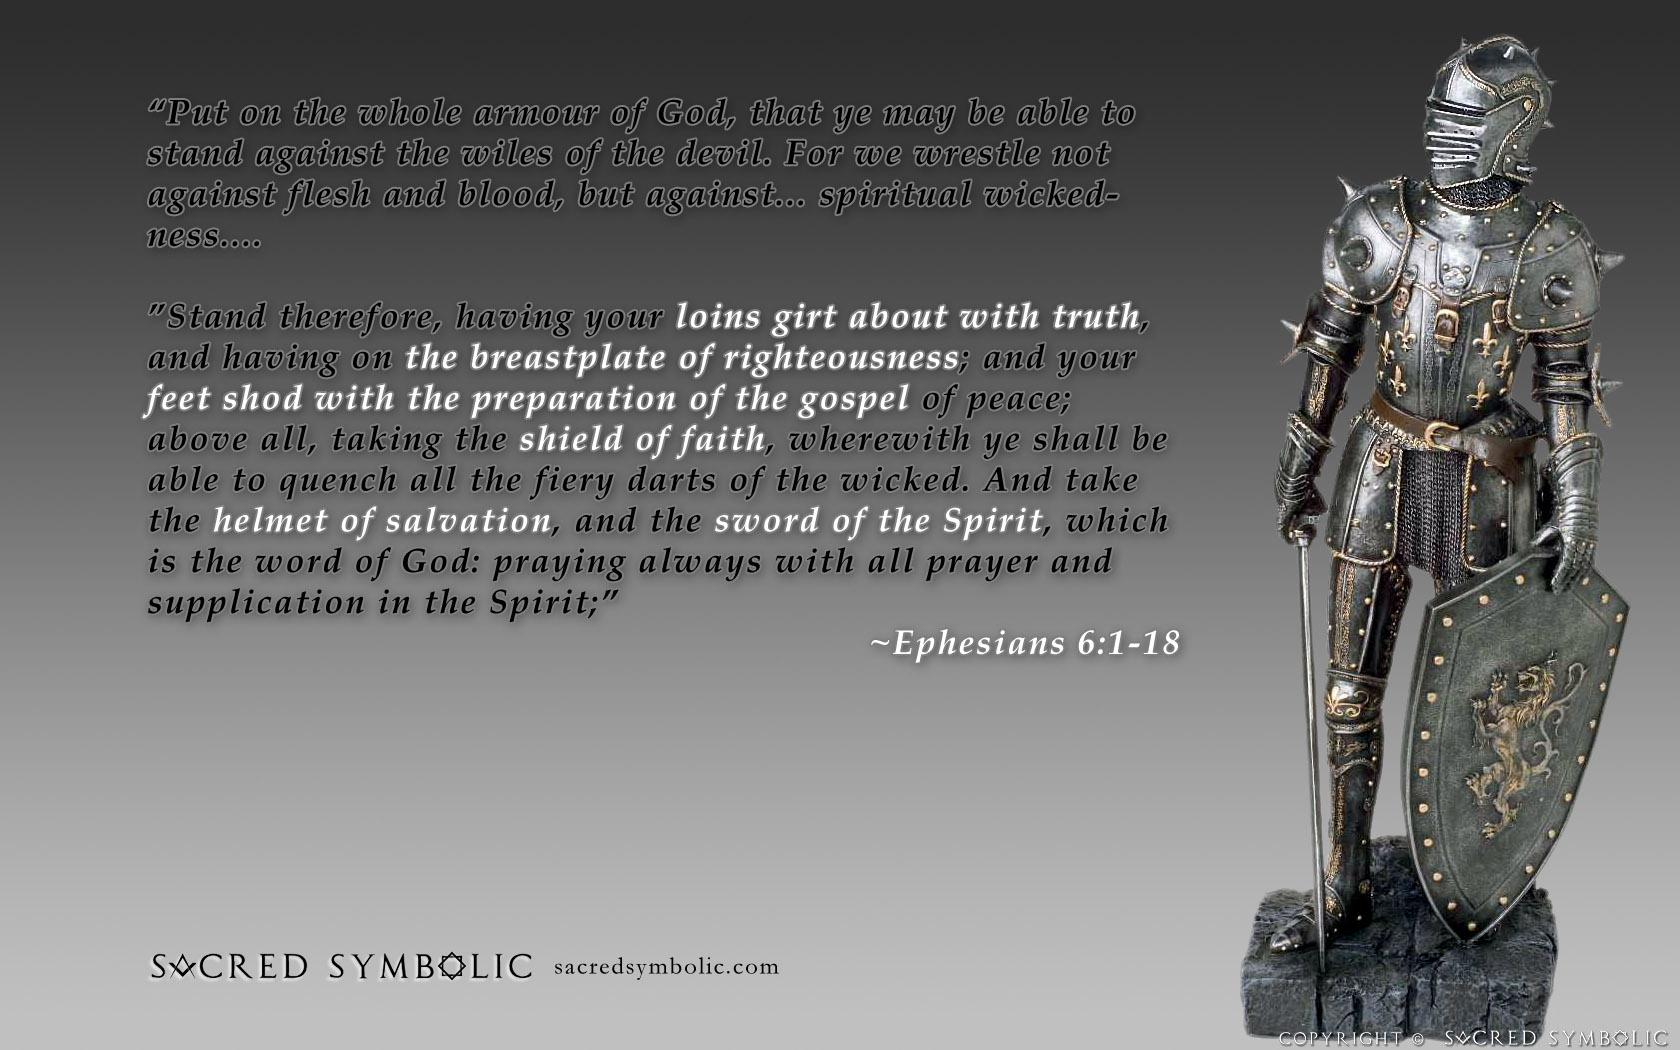 Wallpapers updates sacred symbolic - Armor of god background ...